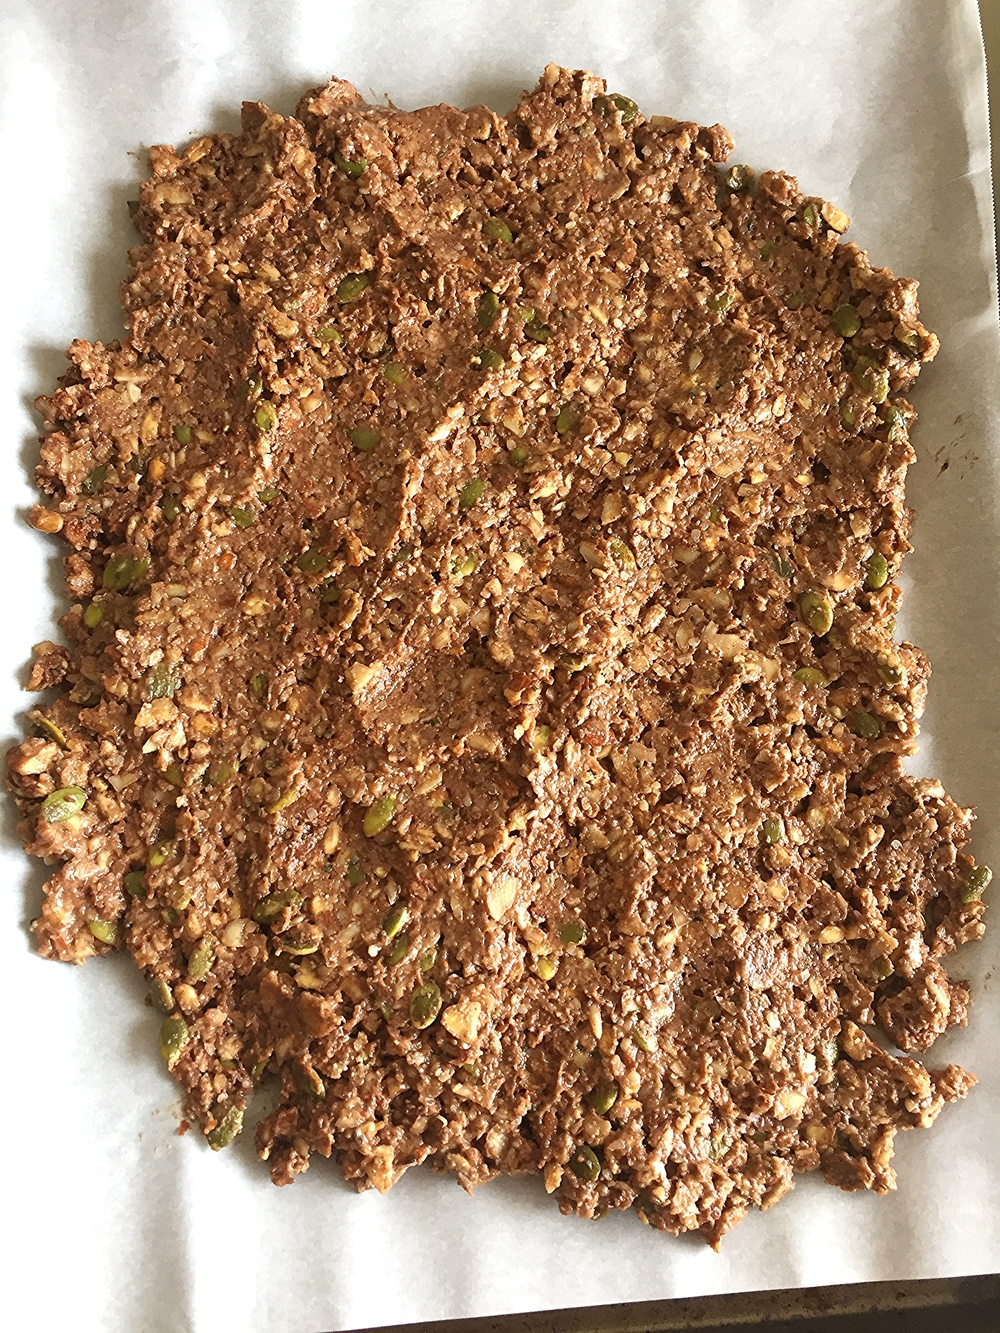 Grain-Free Banola - 3